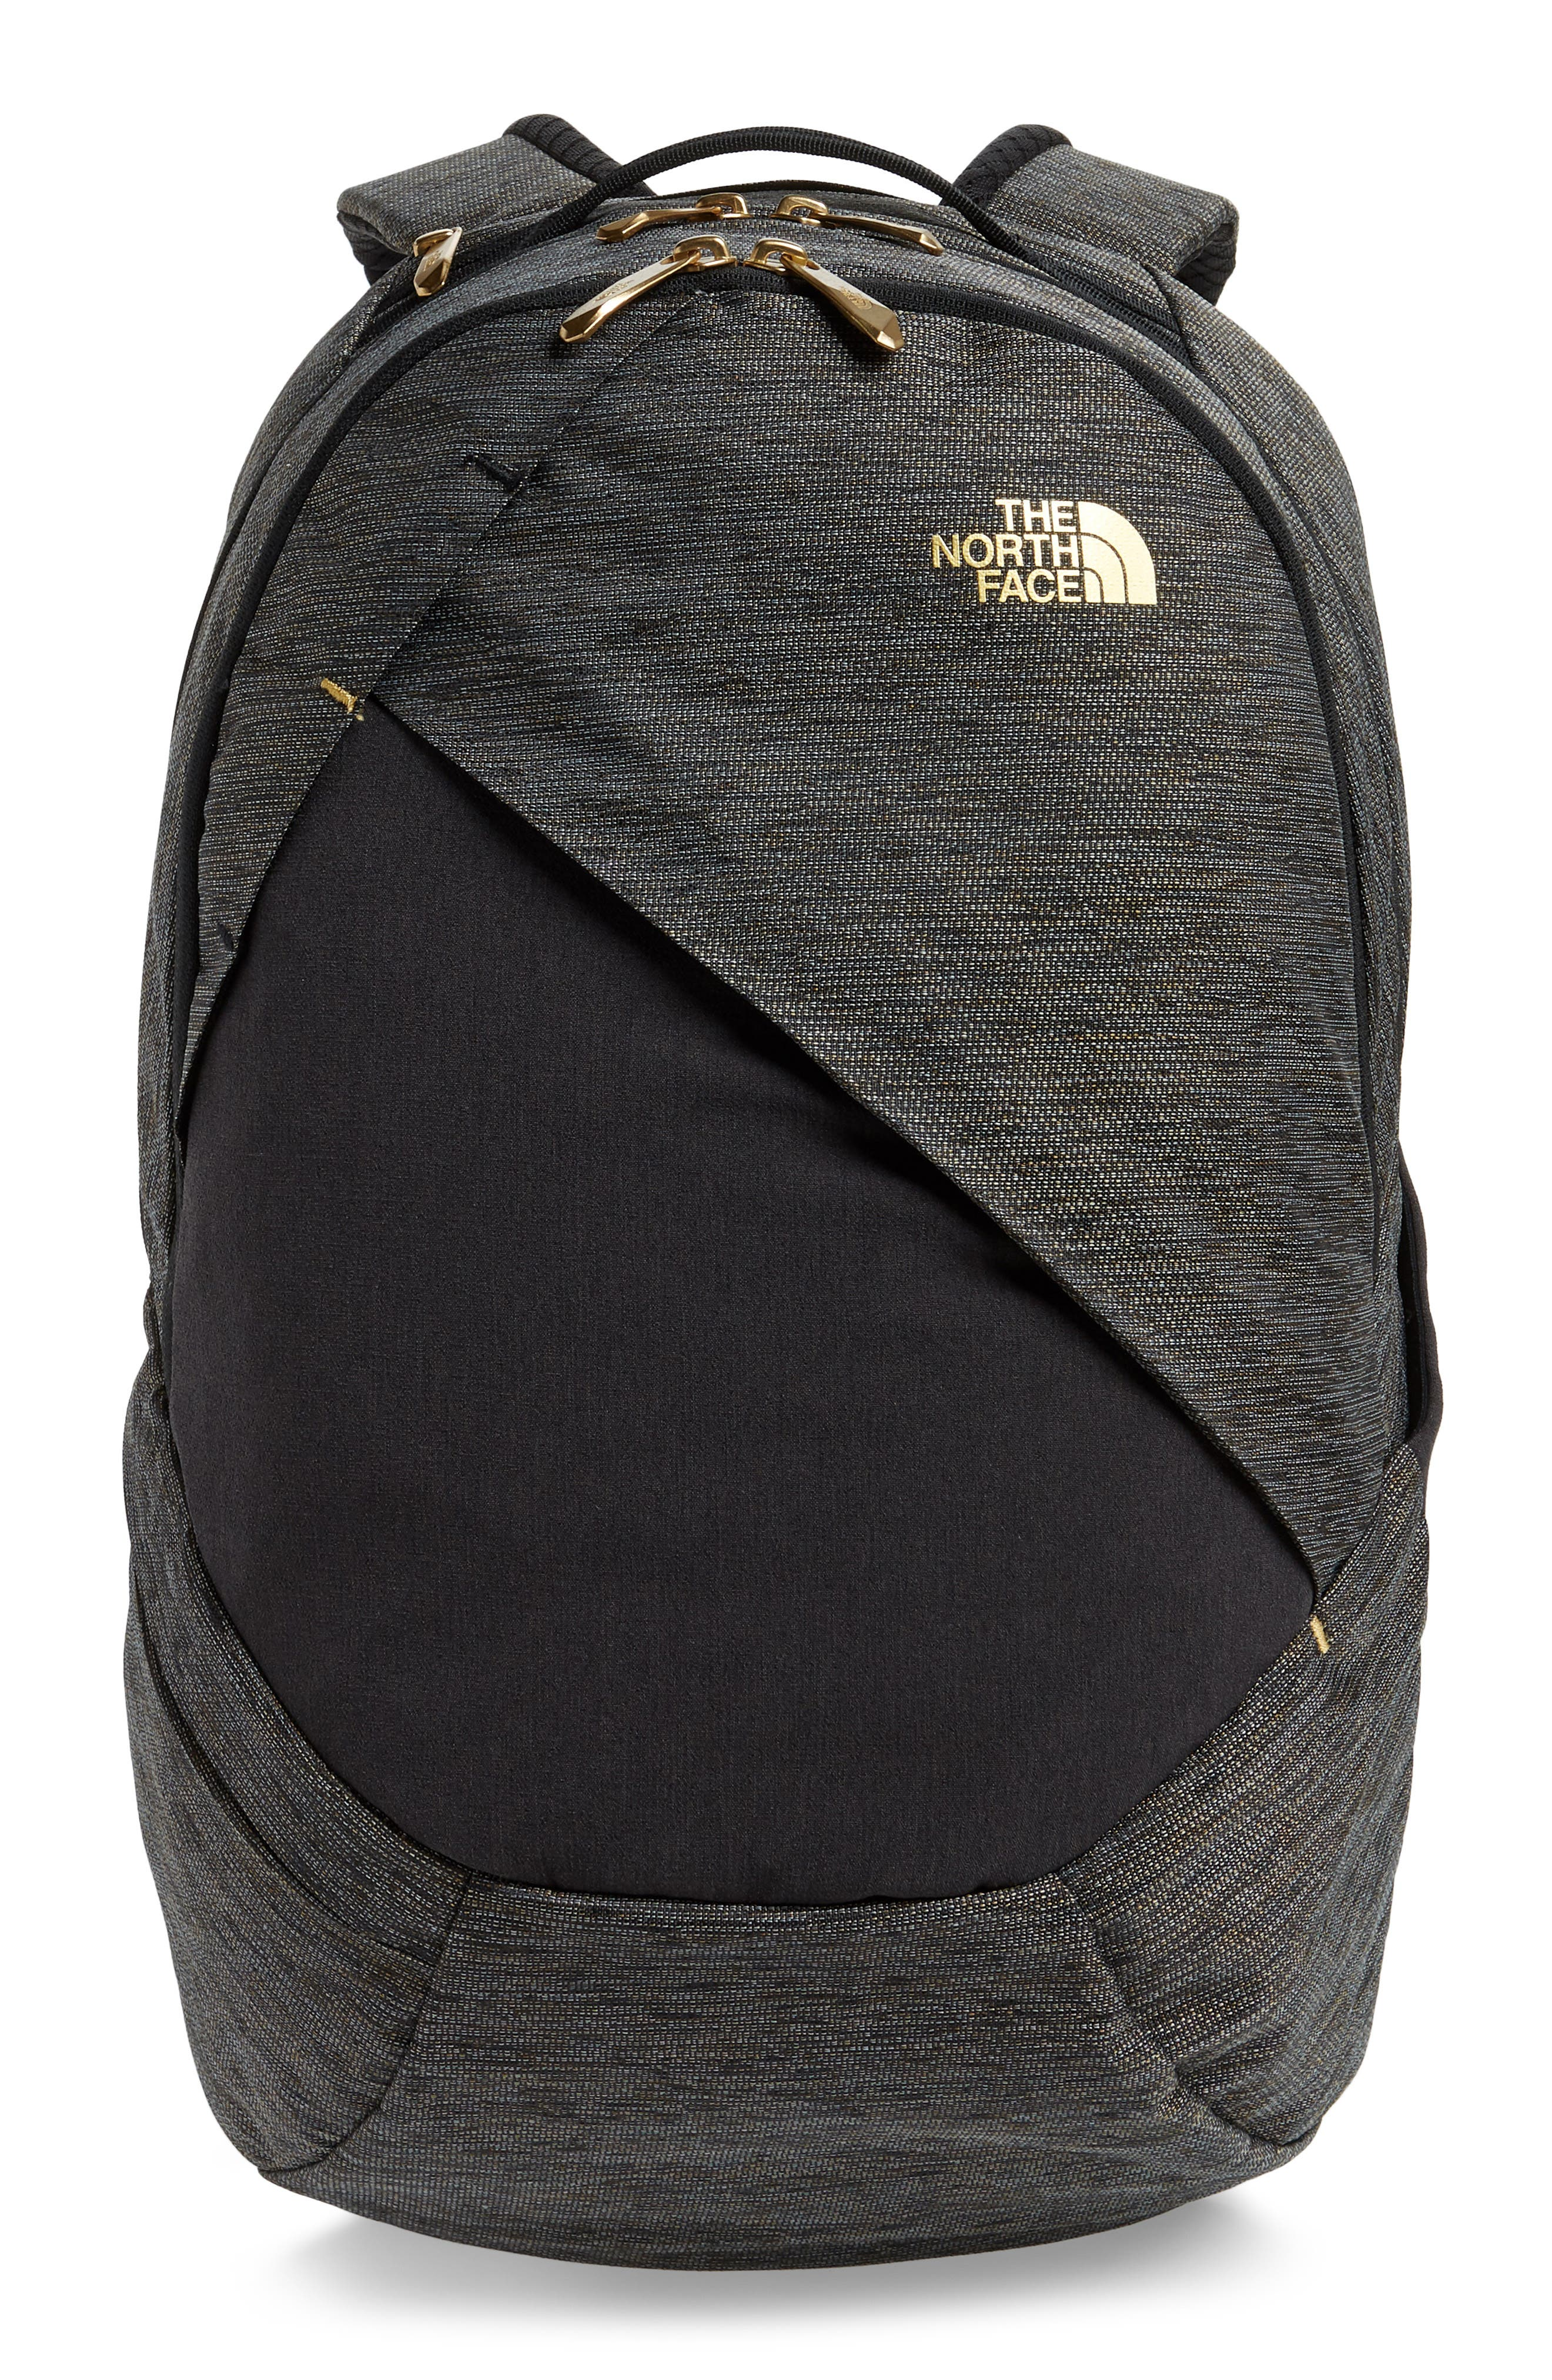 'Isabella' Backpack,                             Main thumbnail 1, color,                             TNF BLACK BRASS MELANGE